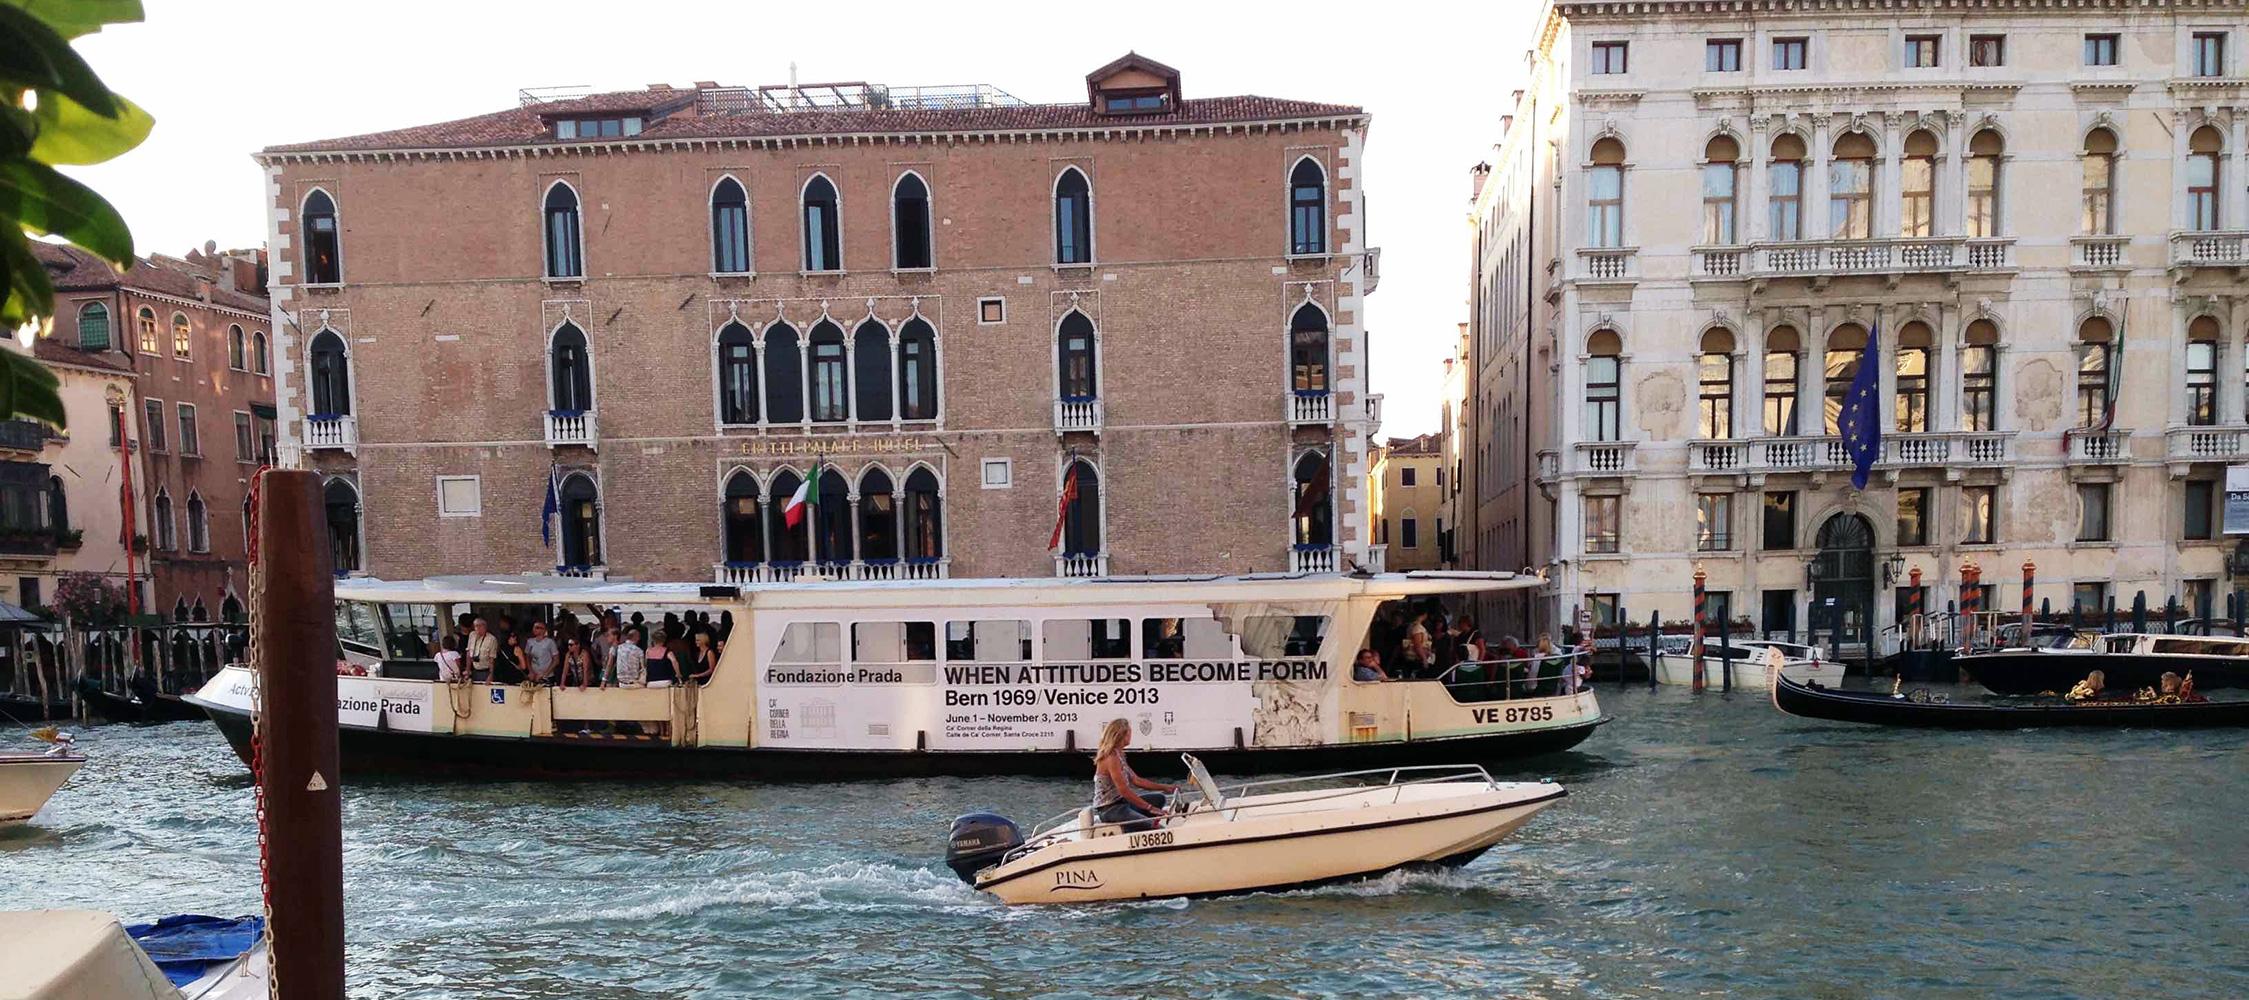 Venise---29.jpg